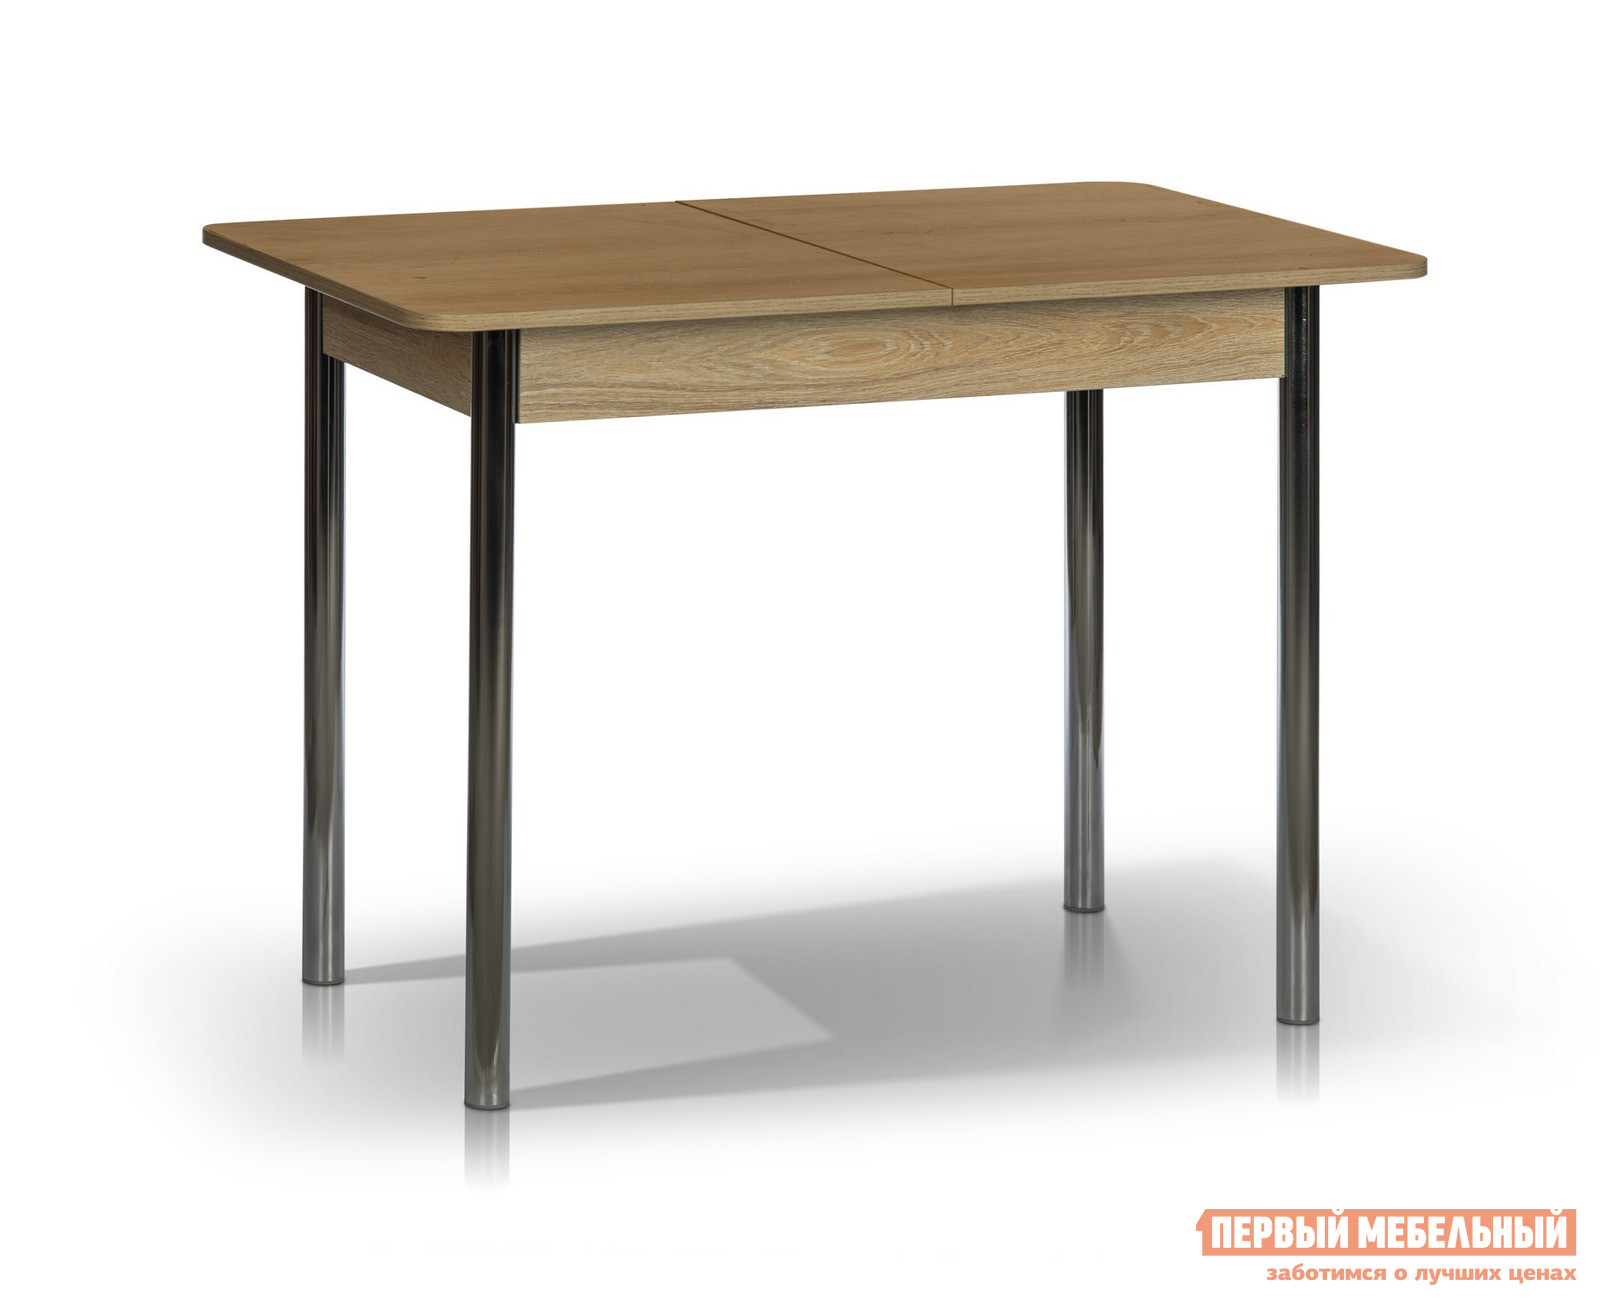 Кухонный стол МегаЭлатон Капри Дуб швейцарский